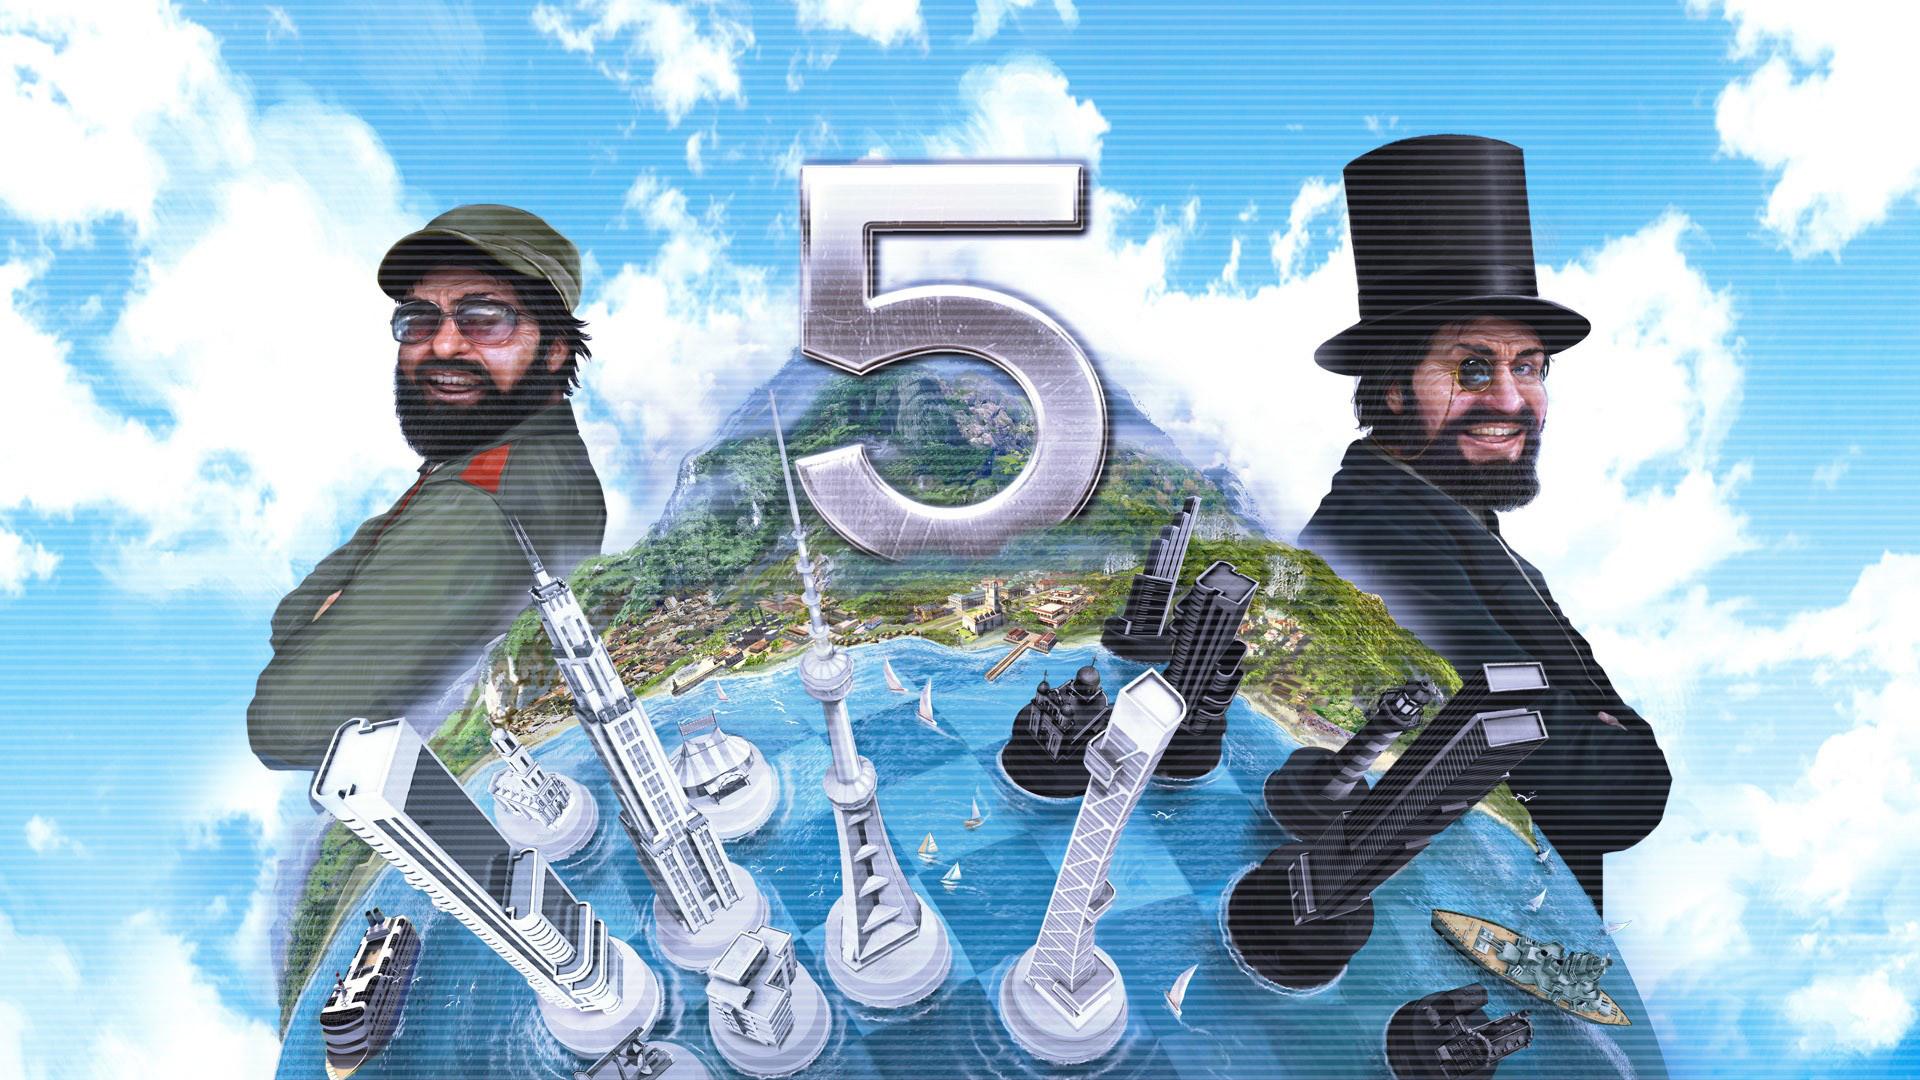 Tropico 5 Wallpaper in 1920x1080